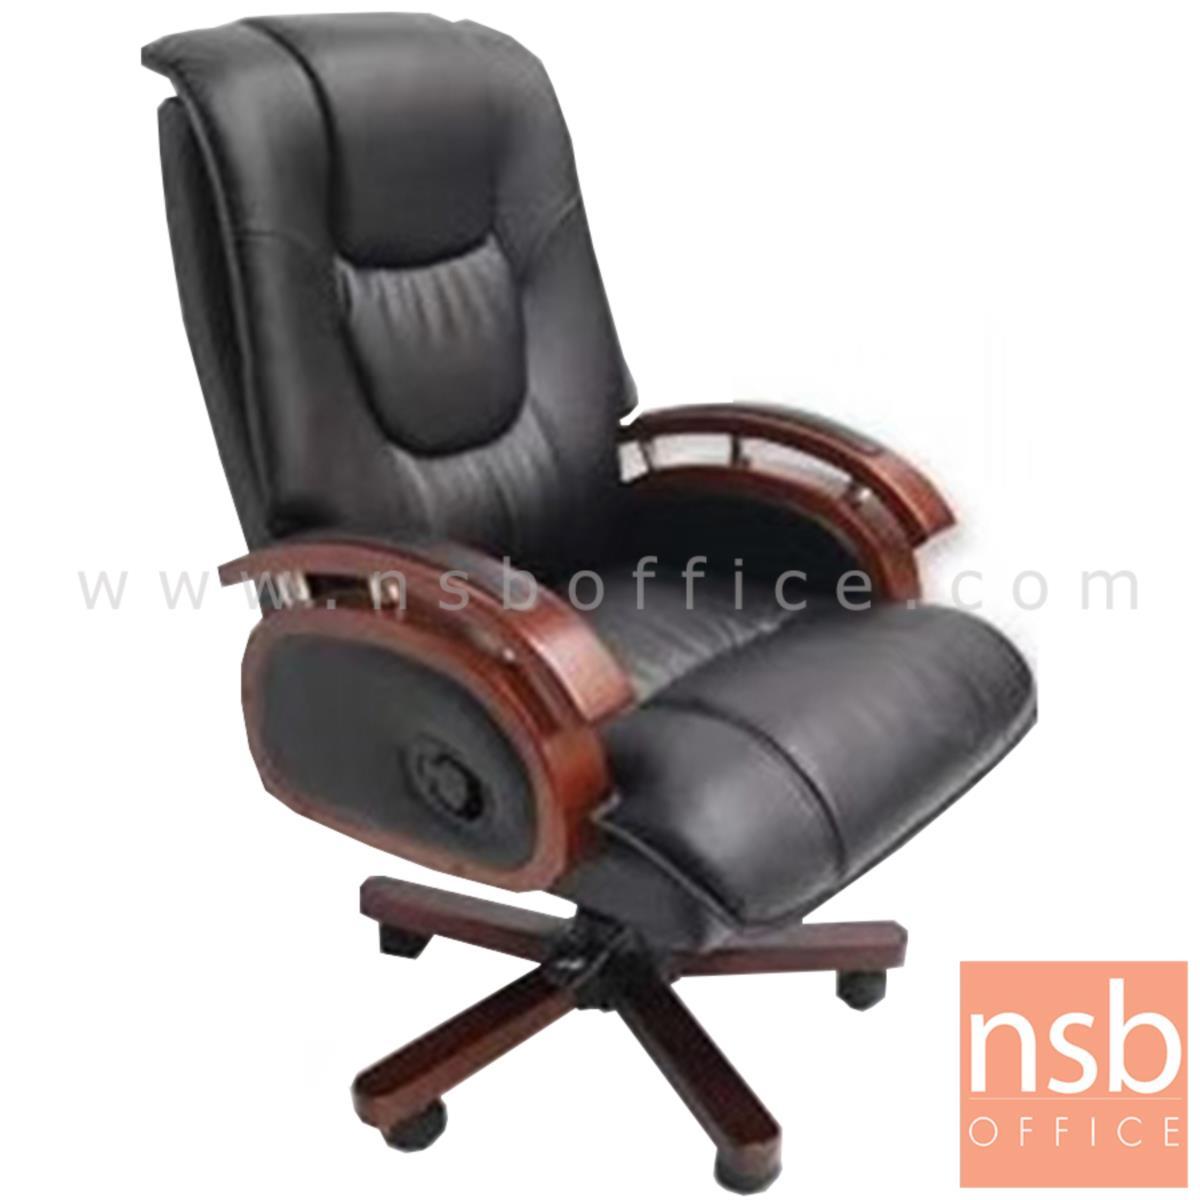 B25A125:เก้าอี้ผู้บริหารหนังเทียม  รุ่น Redfield (เรดฟีลด์)  โช๊คแก๊ส ขาไม้